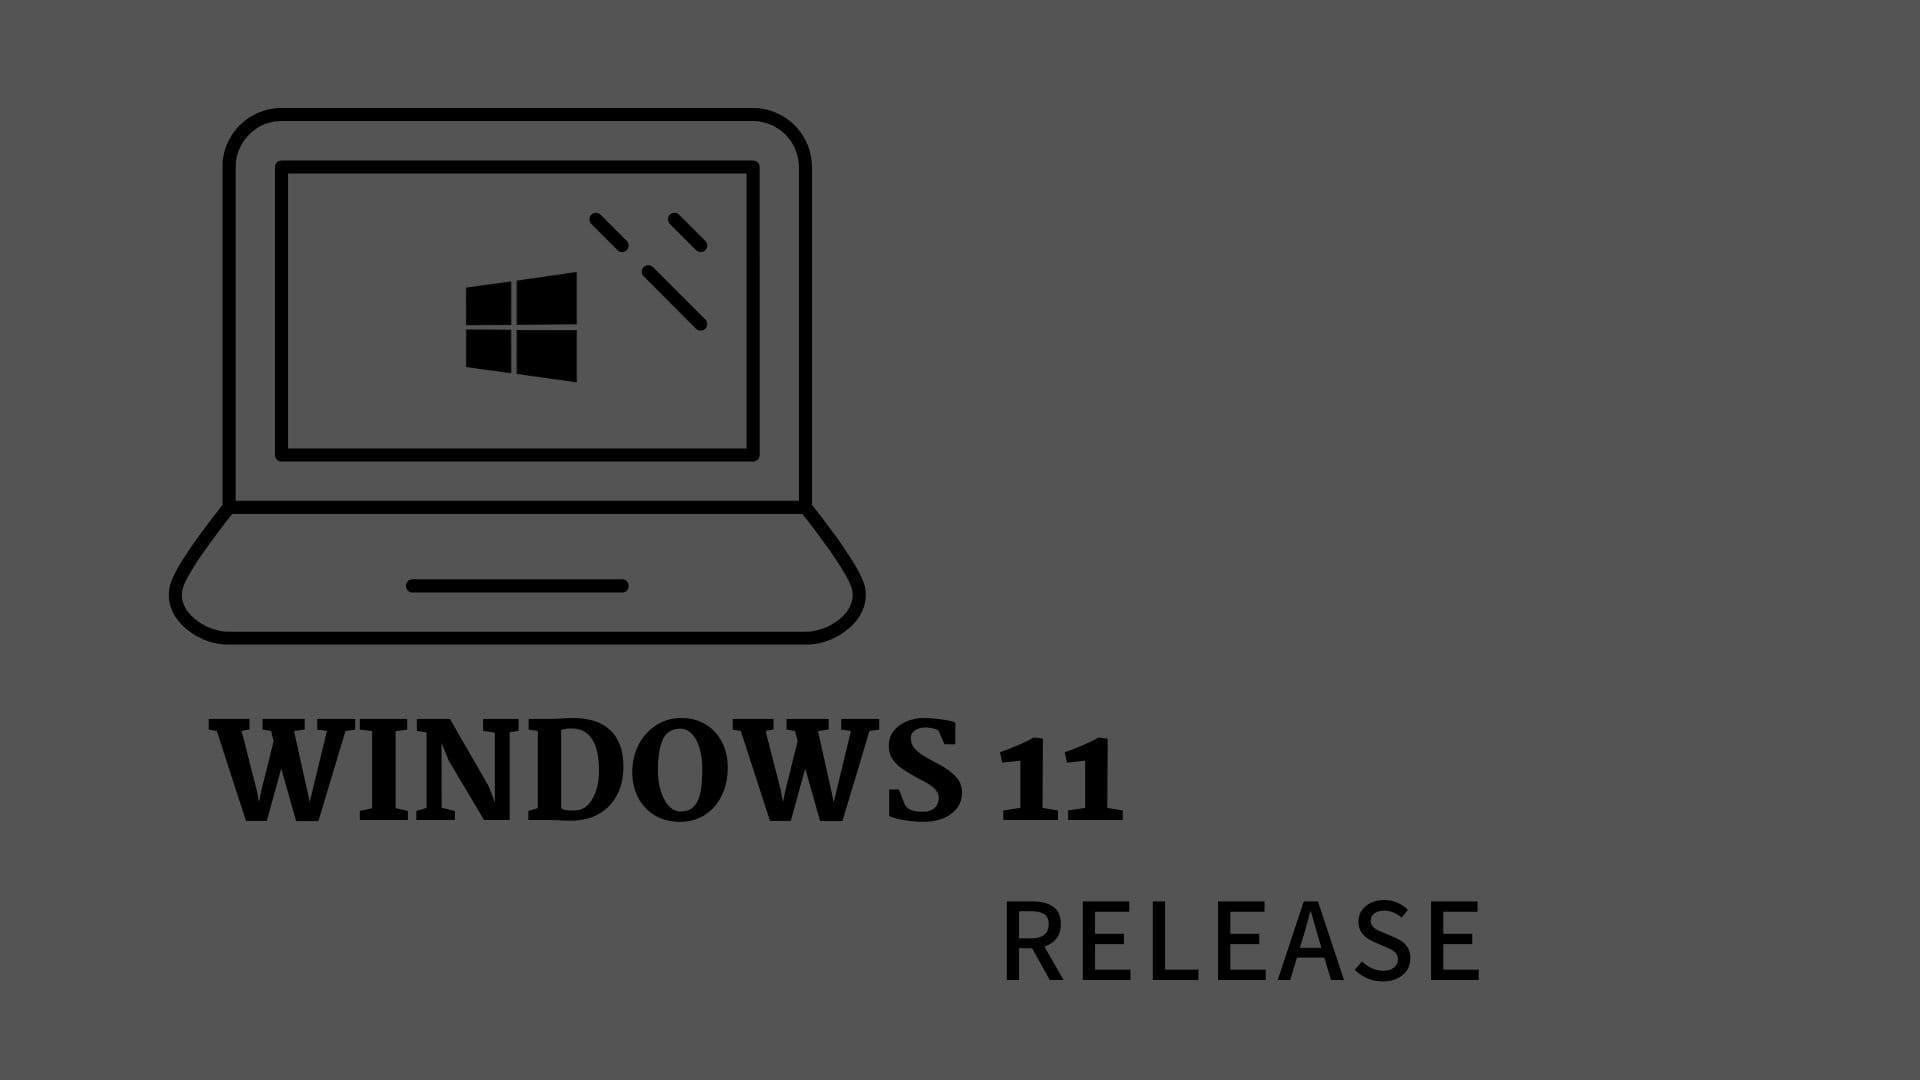 windows 11 24 june